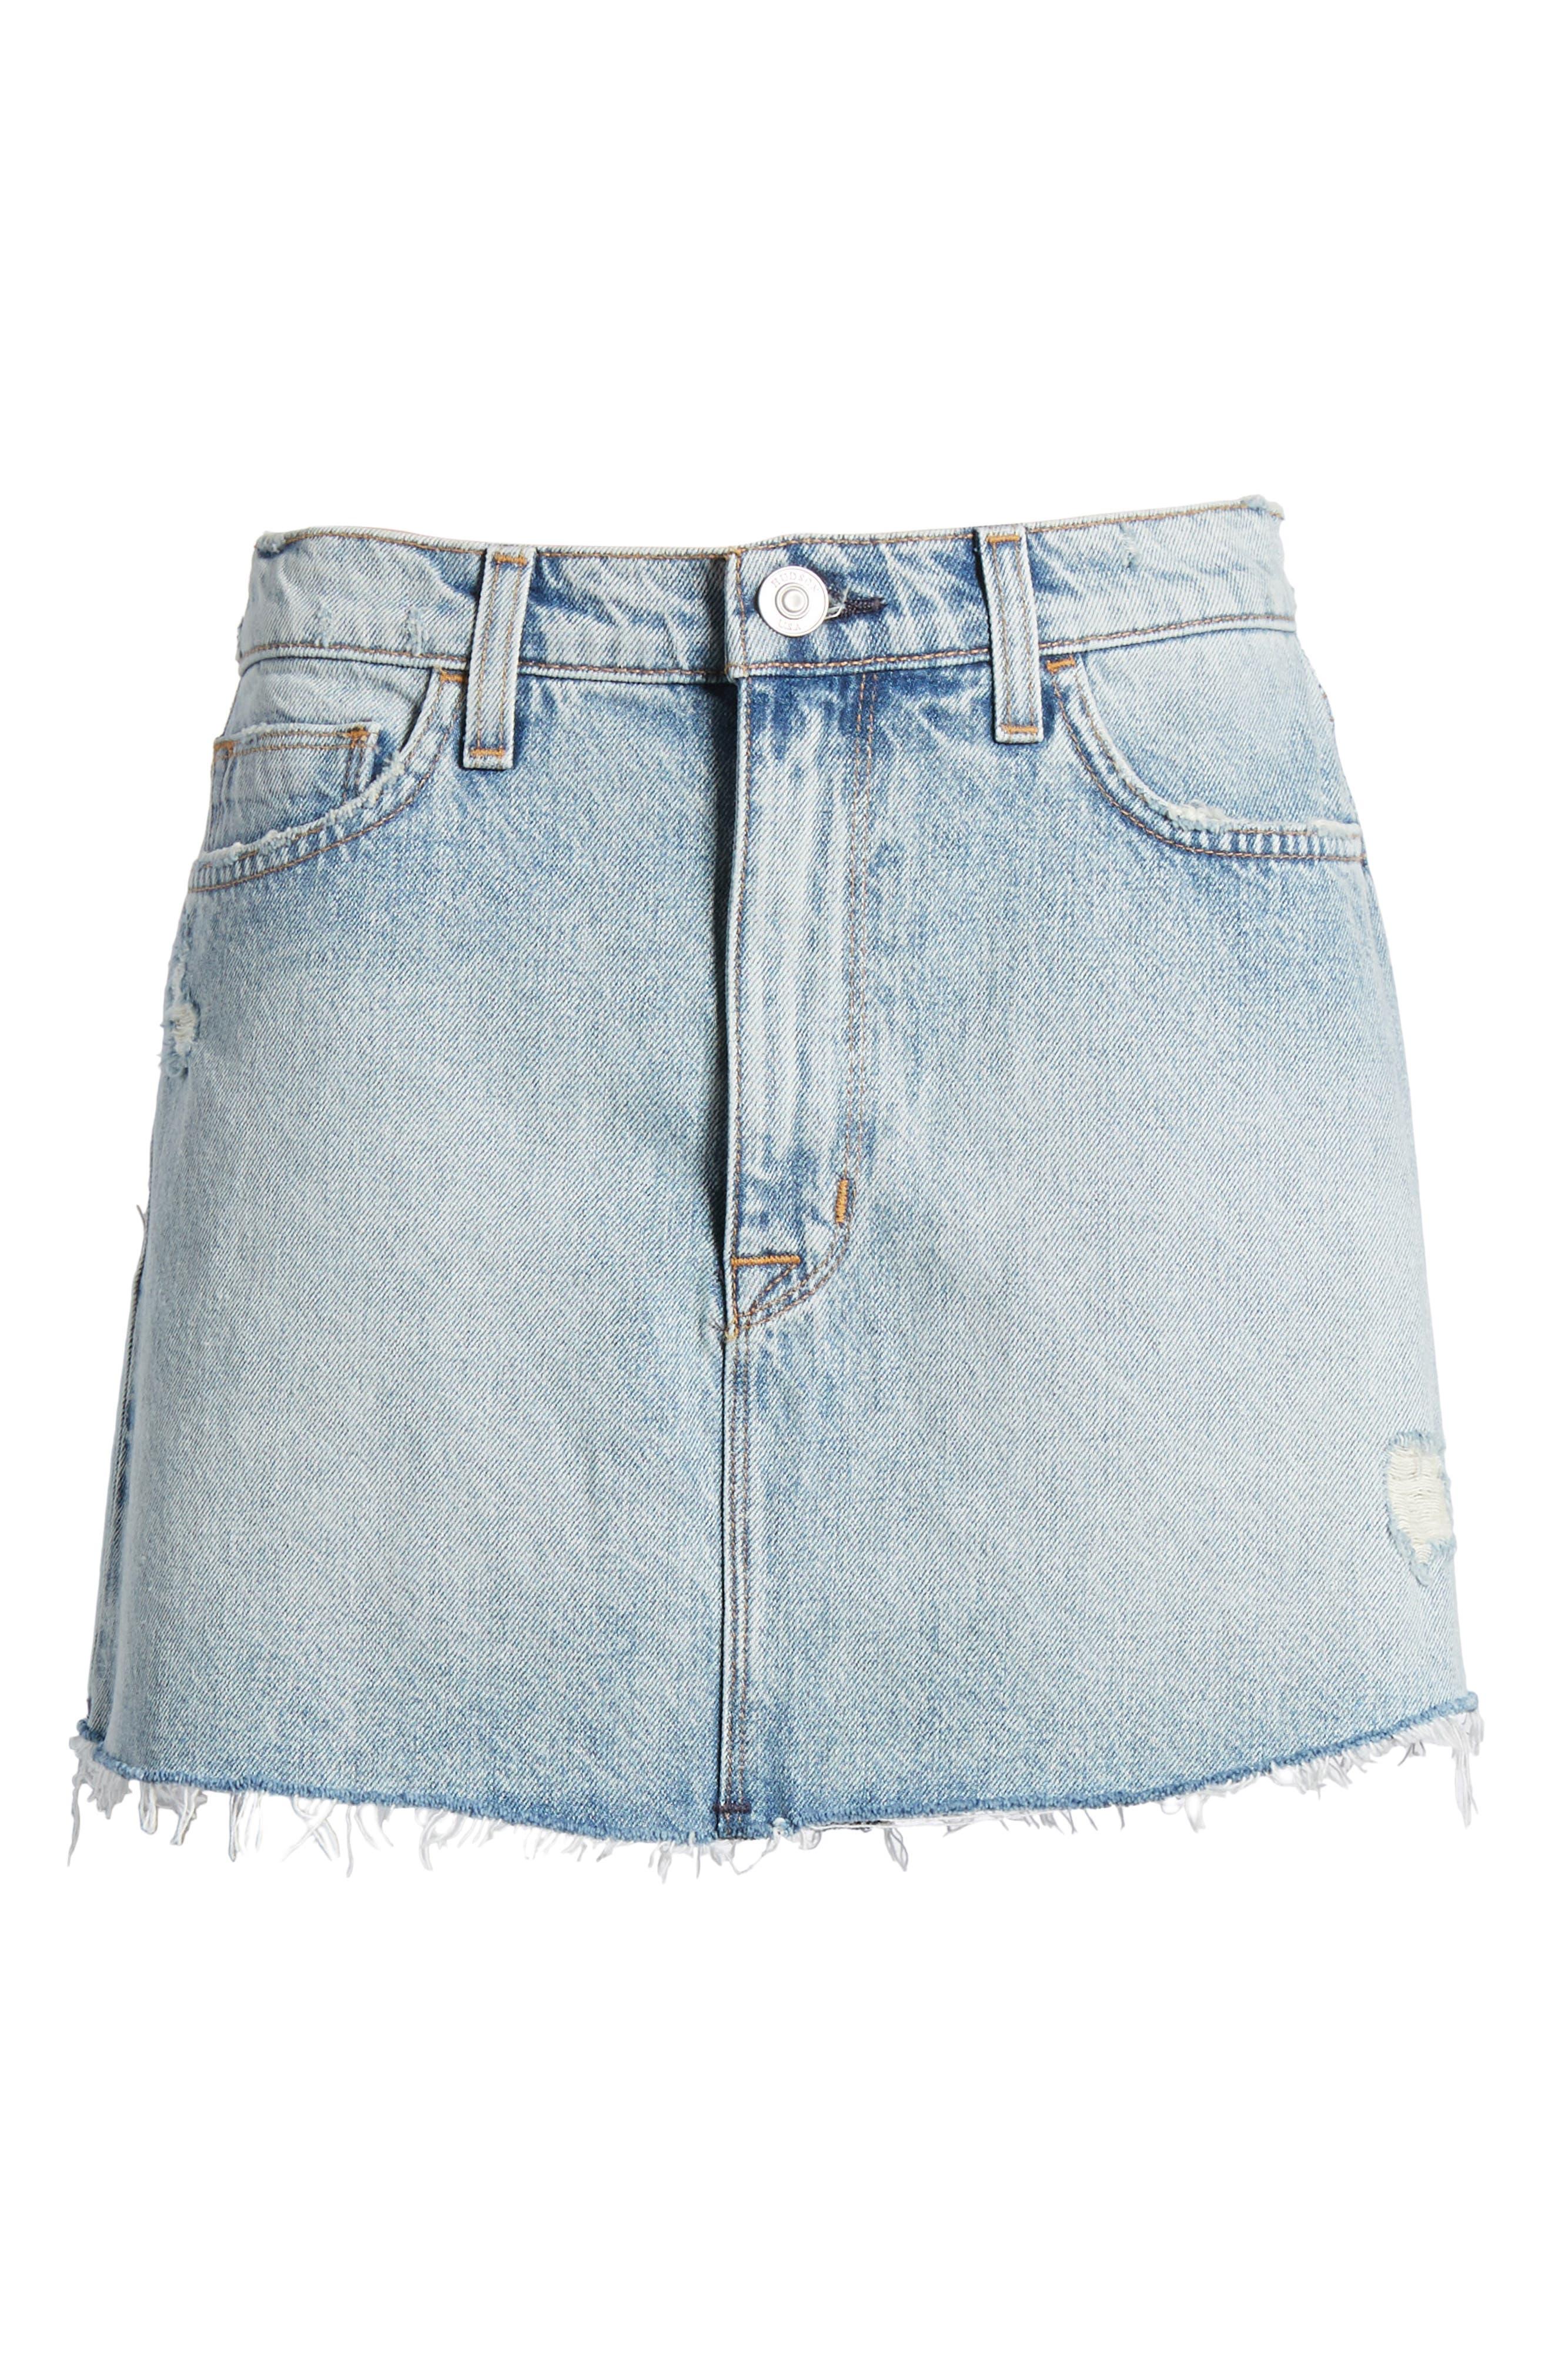 Vivid Cutoff Denim Miniskirt,                             Alternate thumbnail 7, color,                             453